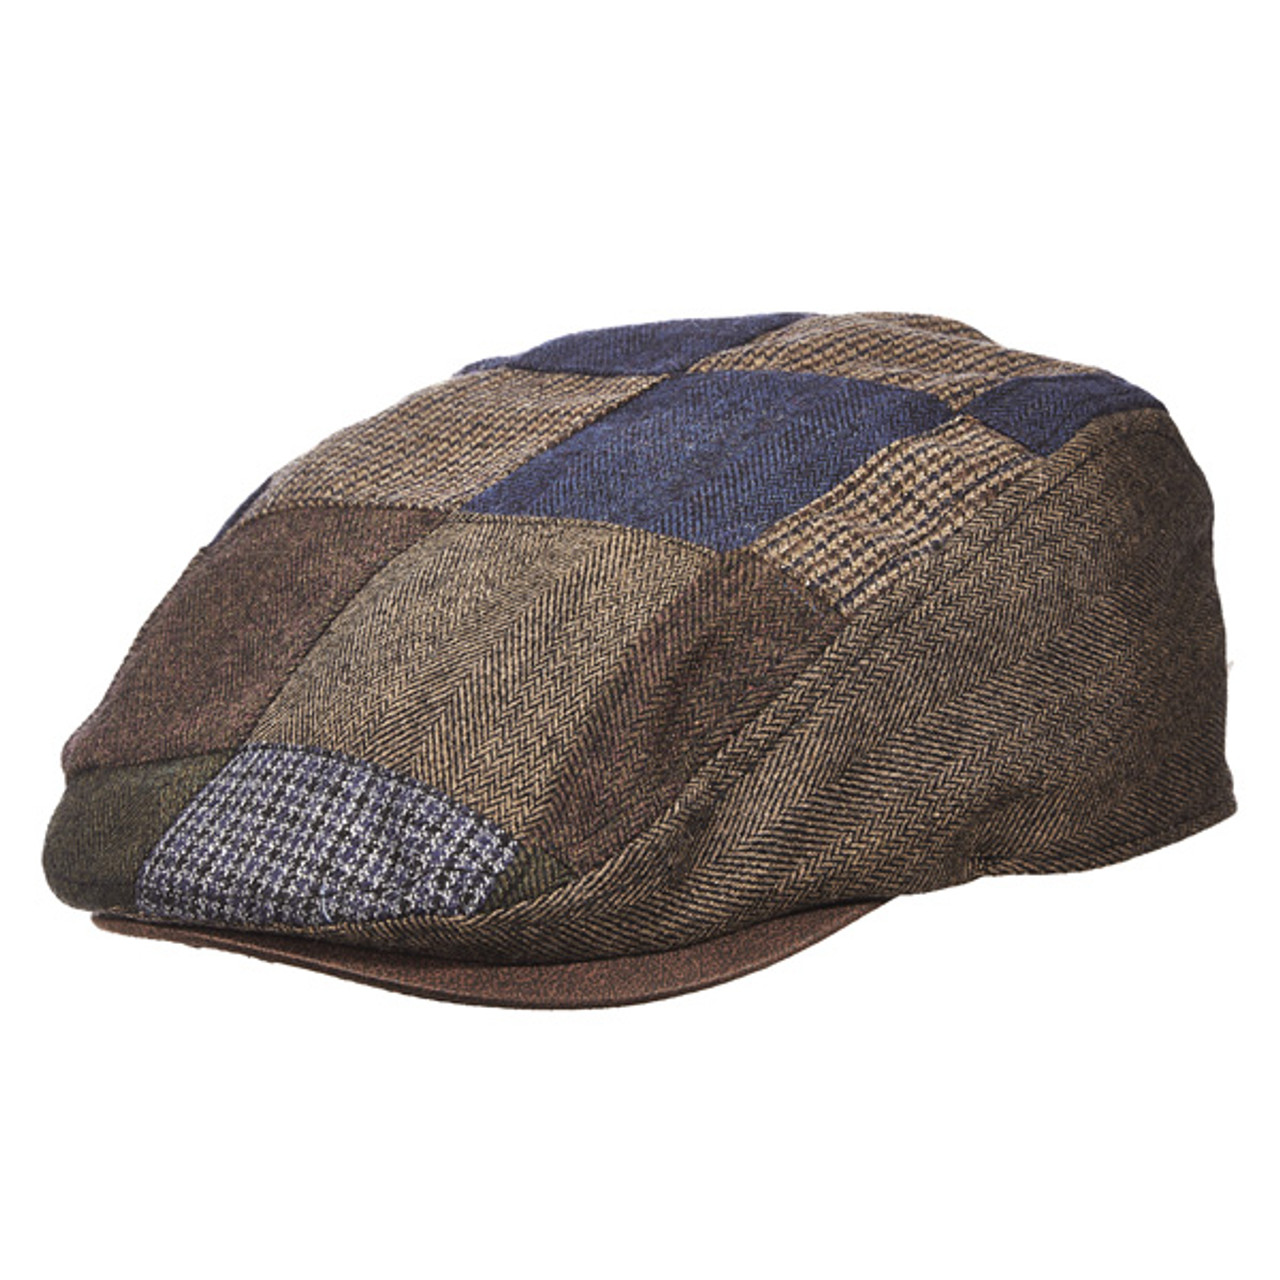 f474d2129 Dorfman Pacific - Wool Plaid Ascot Cap